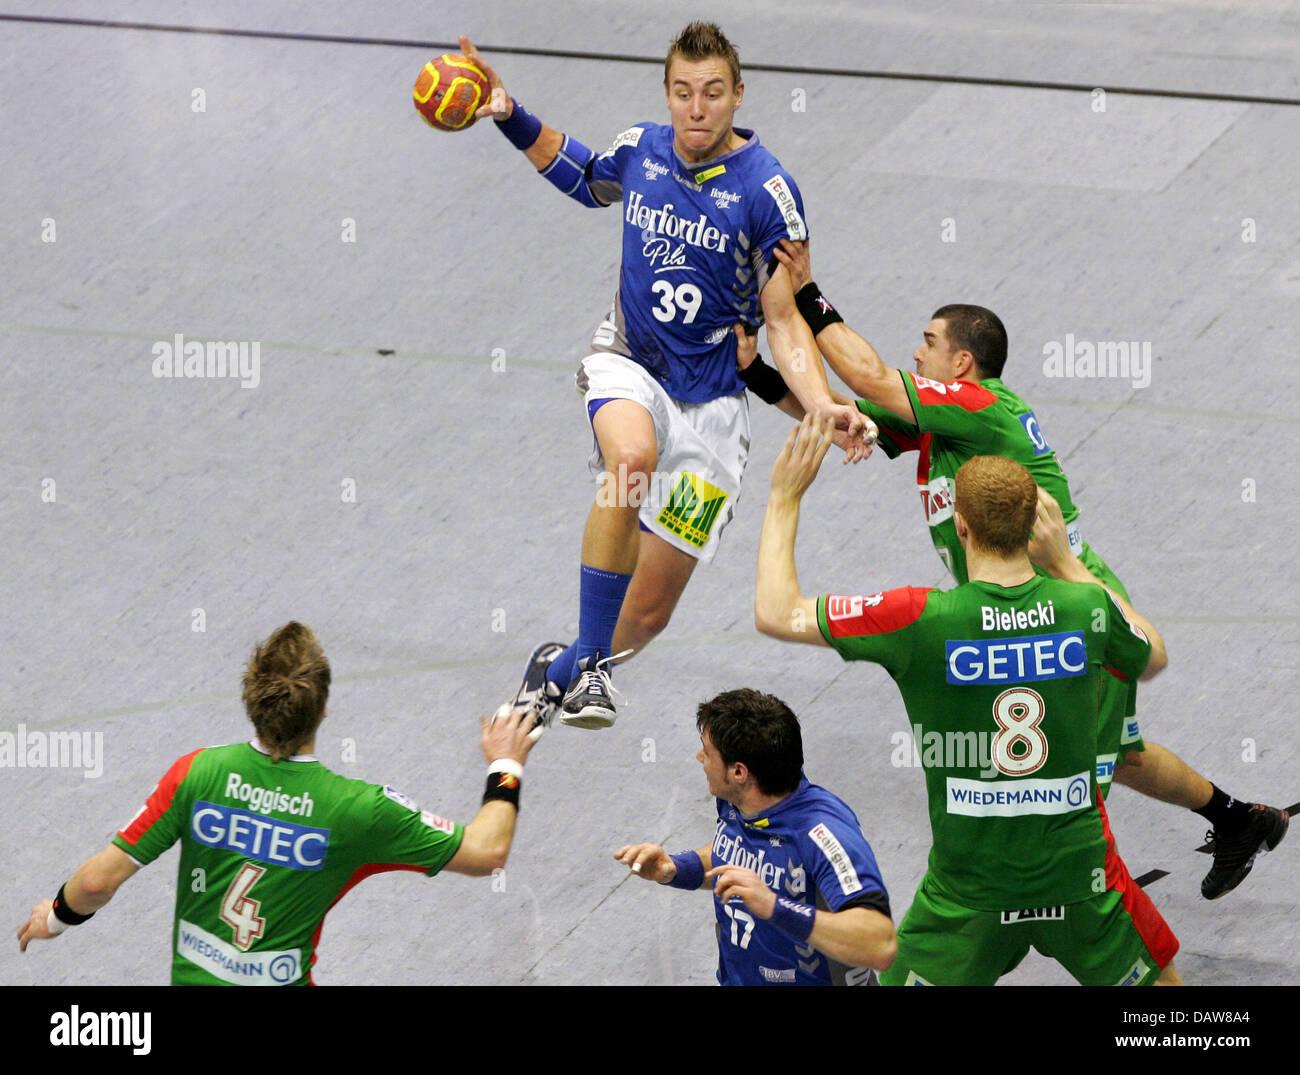 Filip Jicha (C) of Lemgo delivers the ball during the Handball Bundesliga match SC Magdeburg v TBV Lemgo at the - Stock Image